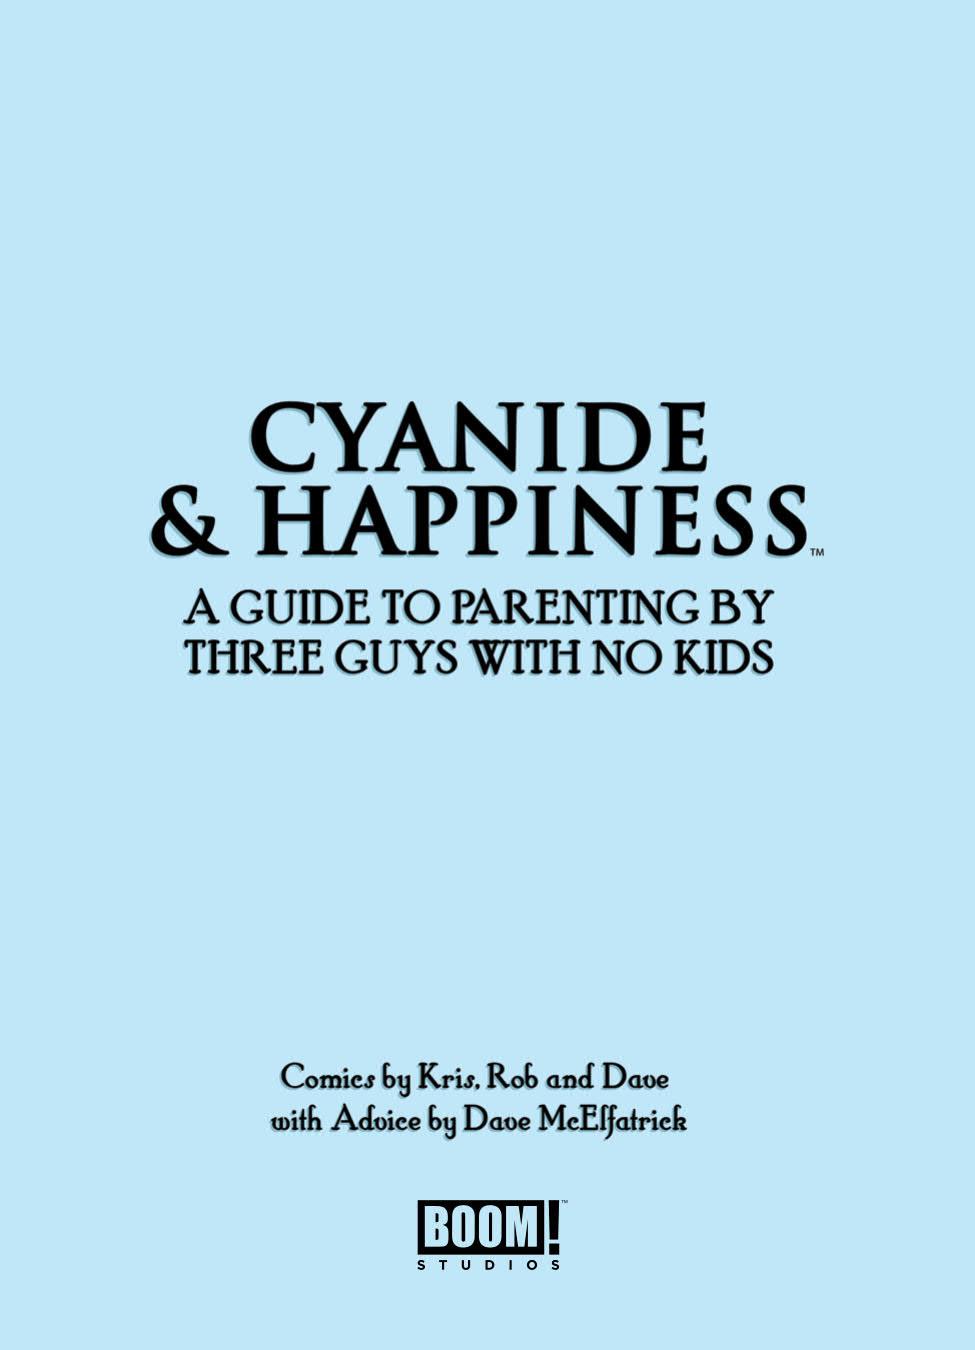 CyanideHappiness_Parenting_SC_PRESS_3